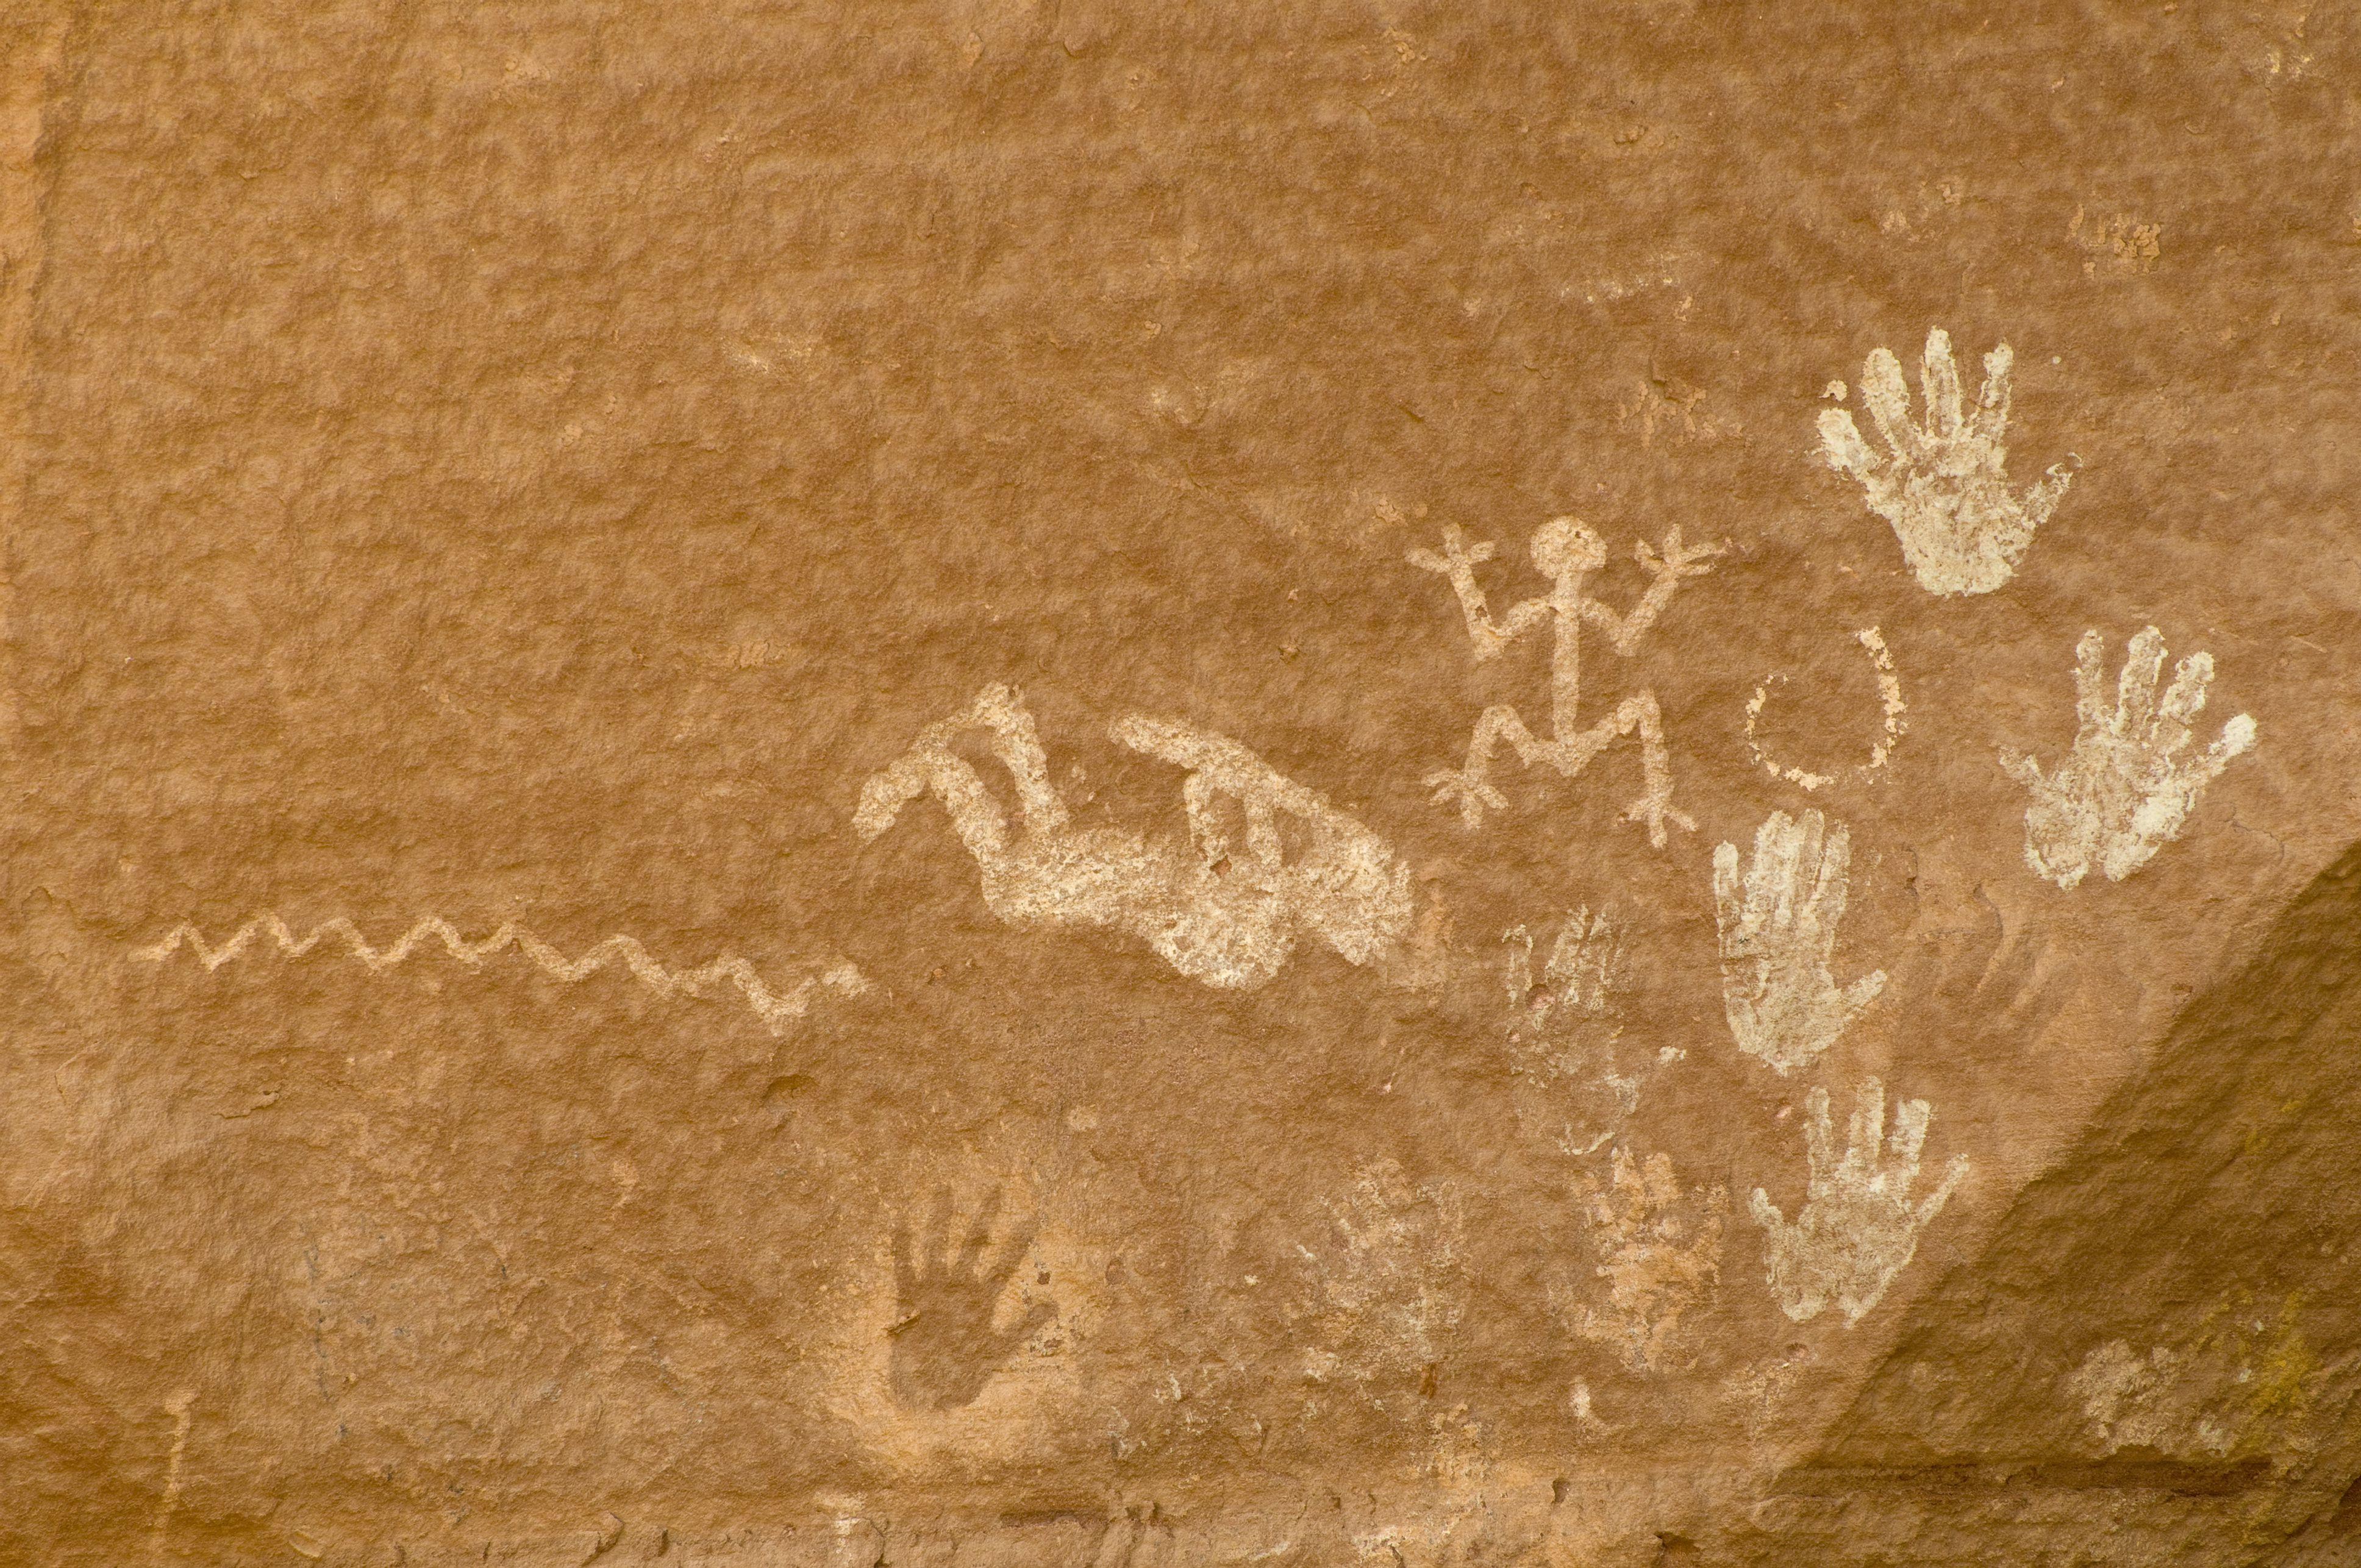 Kokopelli pictograph